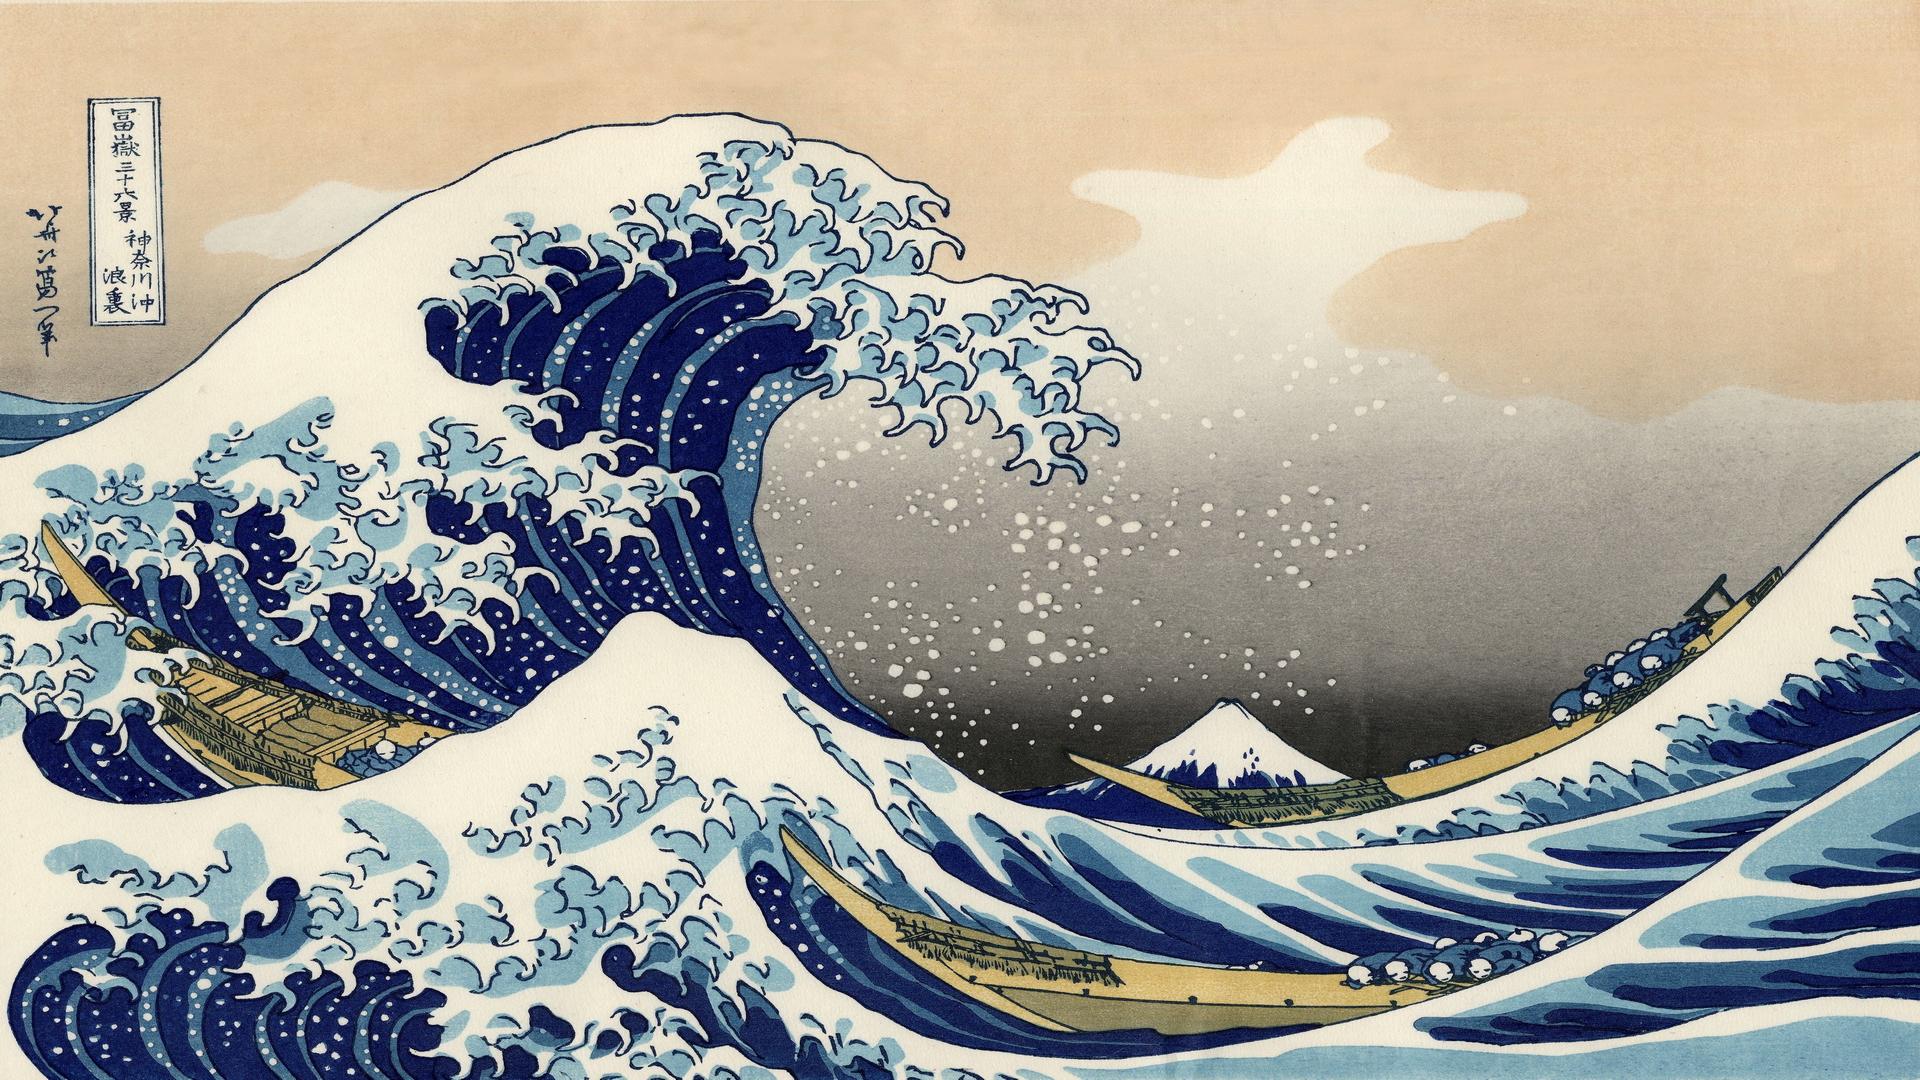 Hd wallpaper japan - Tsunami Hit Soloman Island In 2013 Exploratory Technology 104